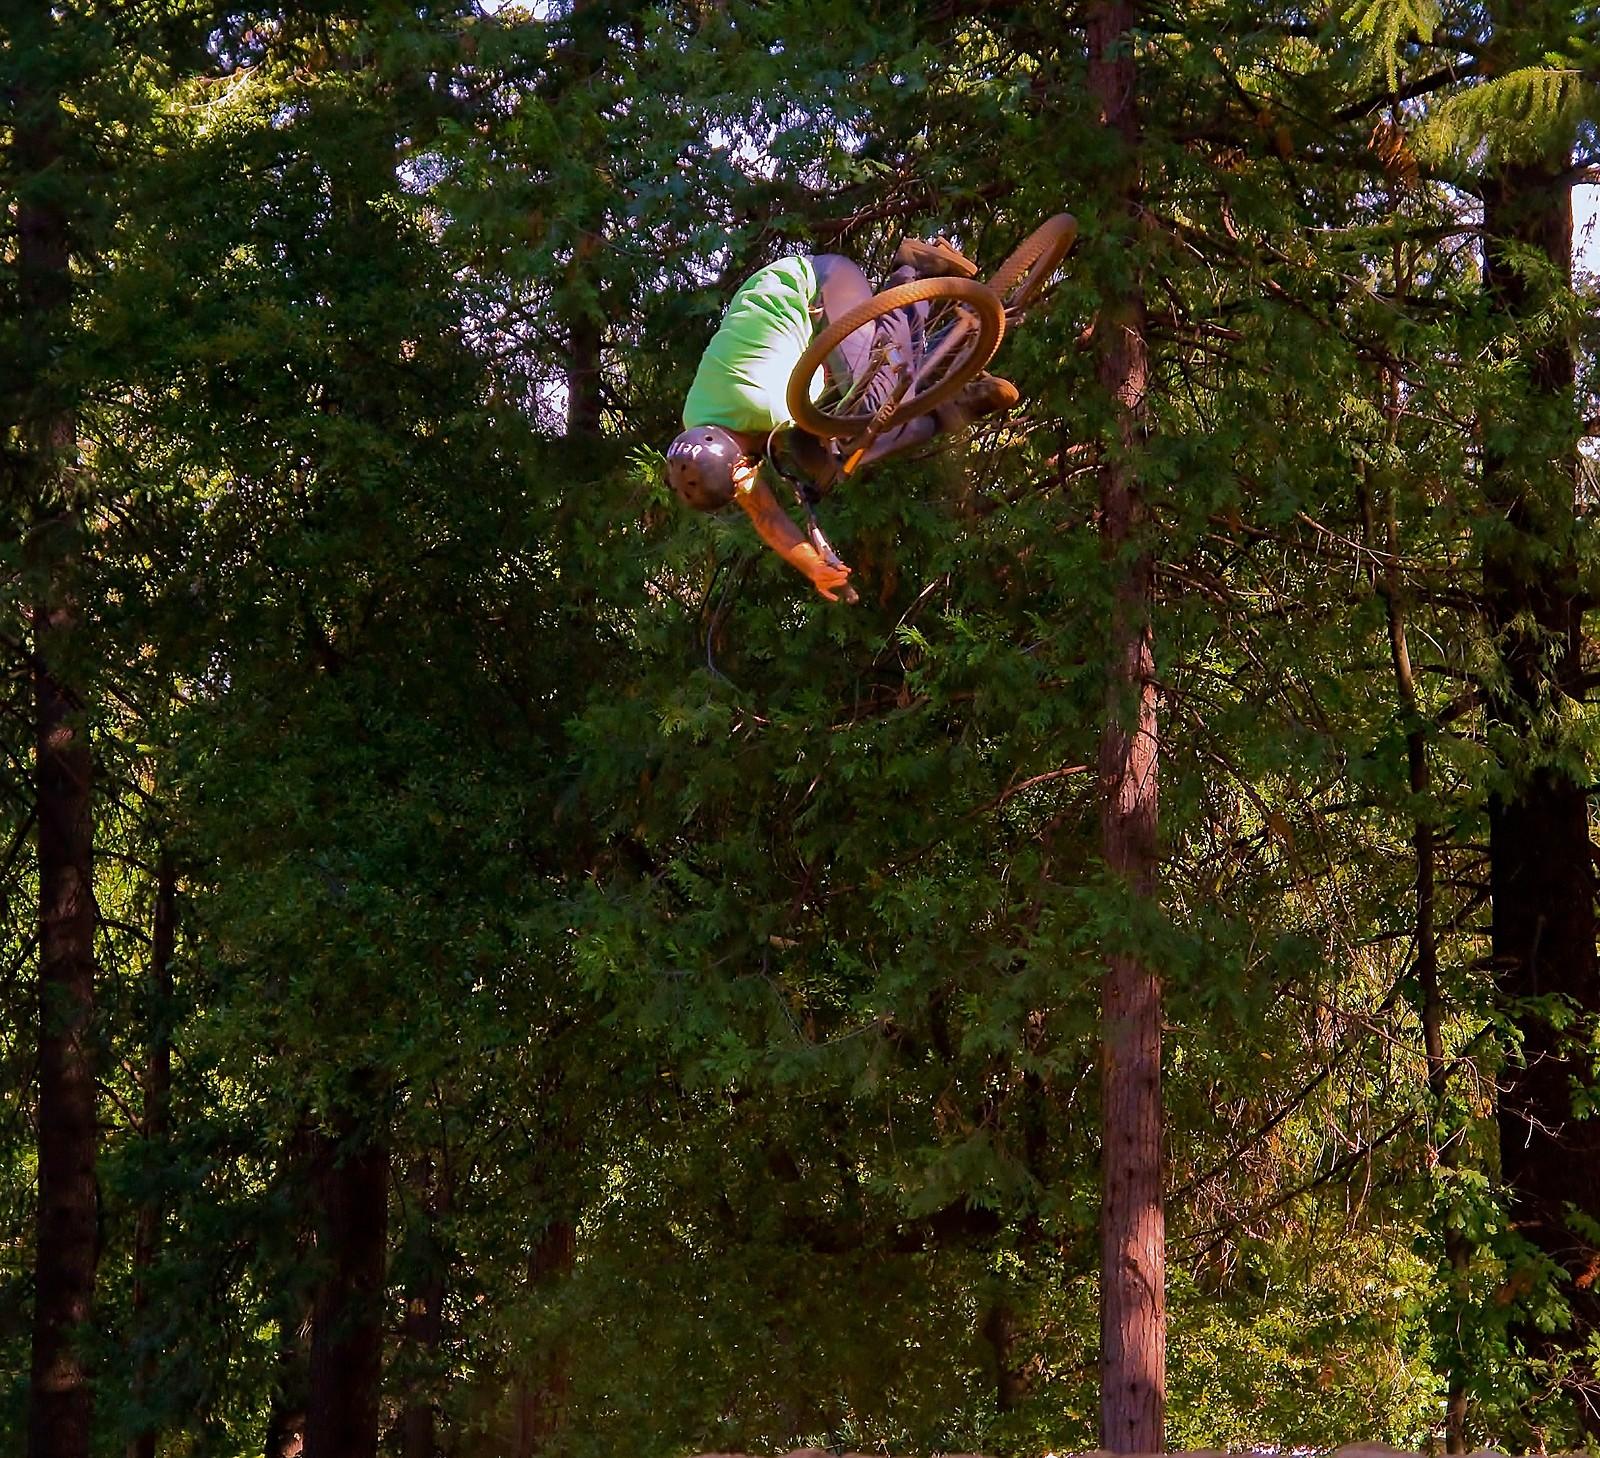 Zach3tabe - ZD - Mountain Biking Pictures - Vital MTB